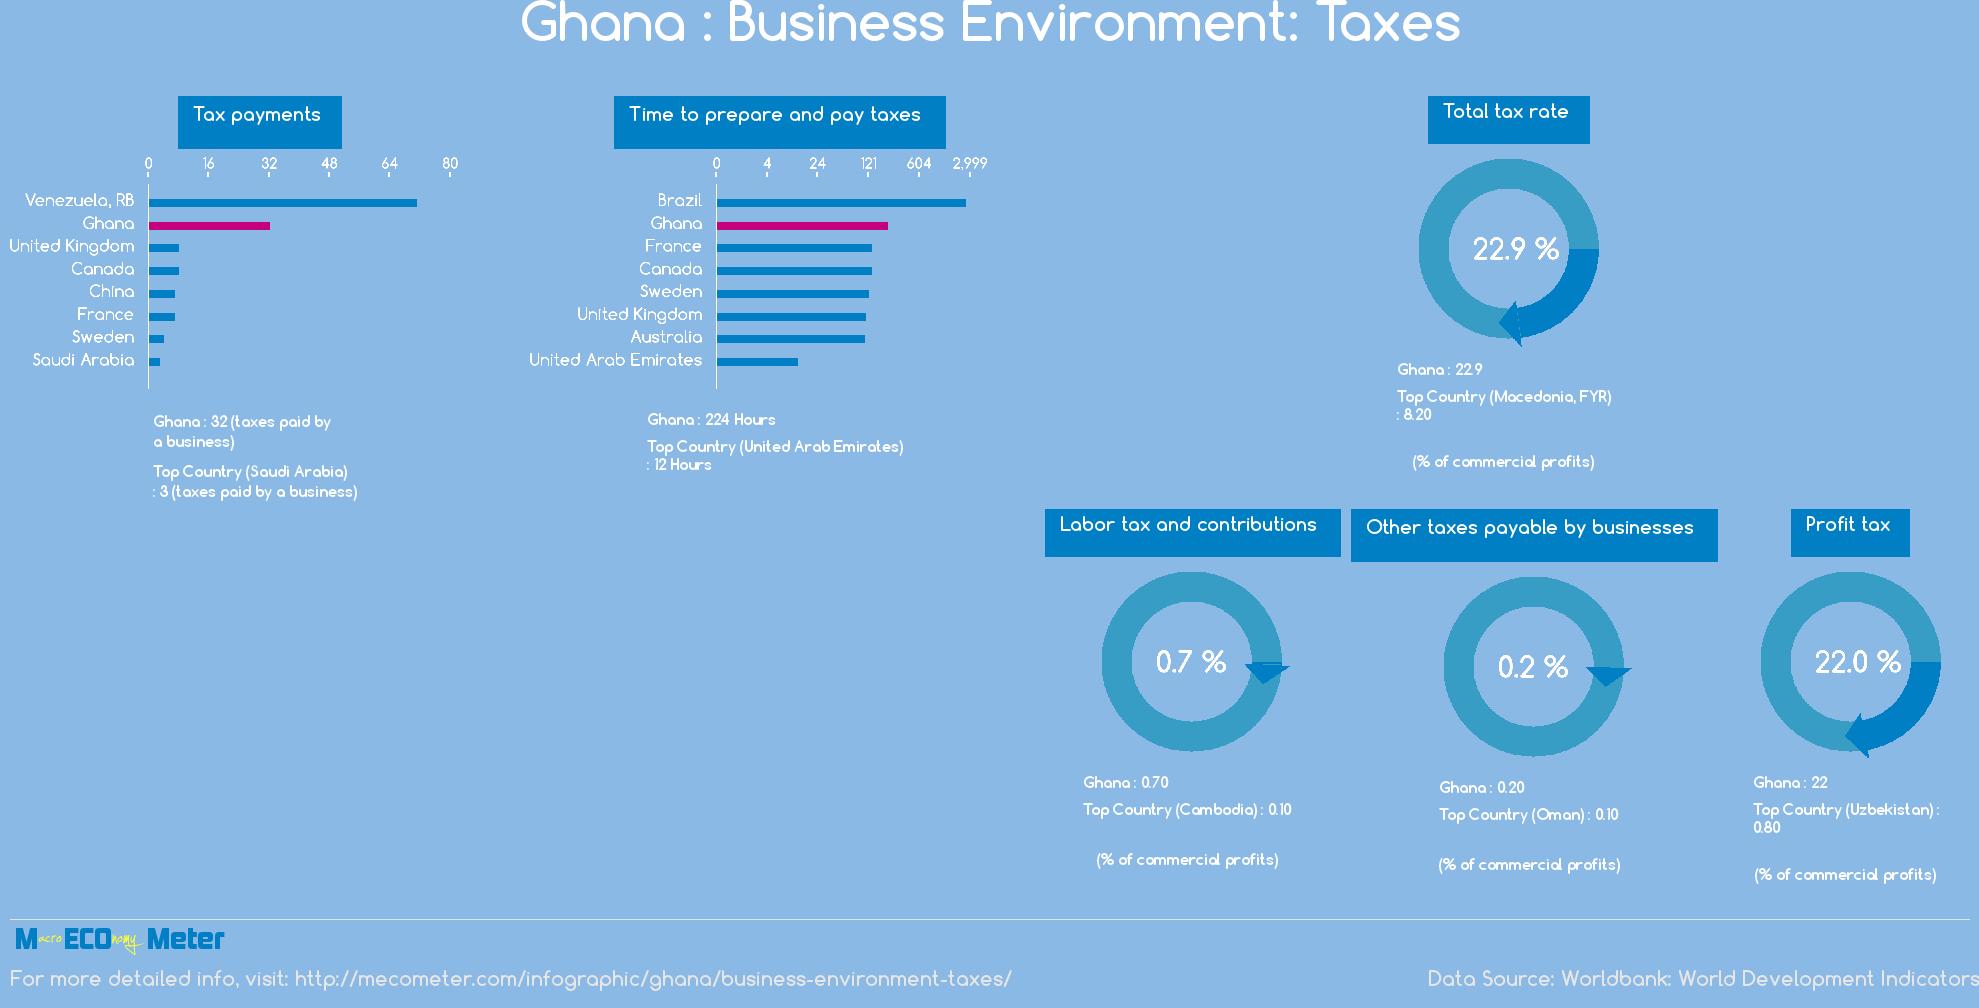 Ghana : Business Environment: Taxes